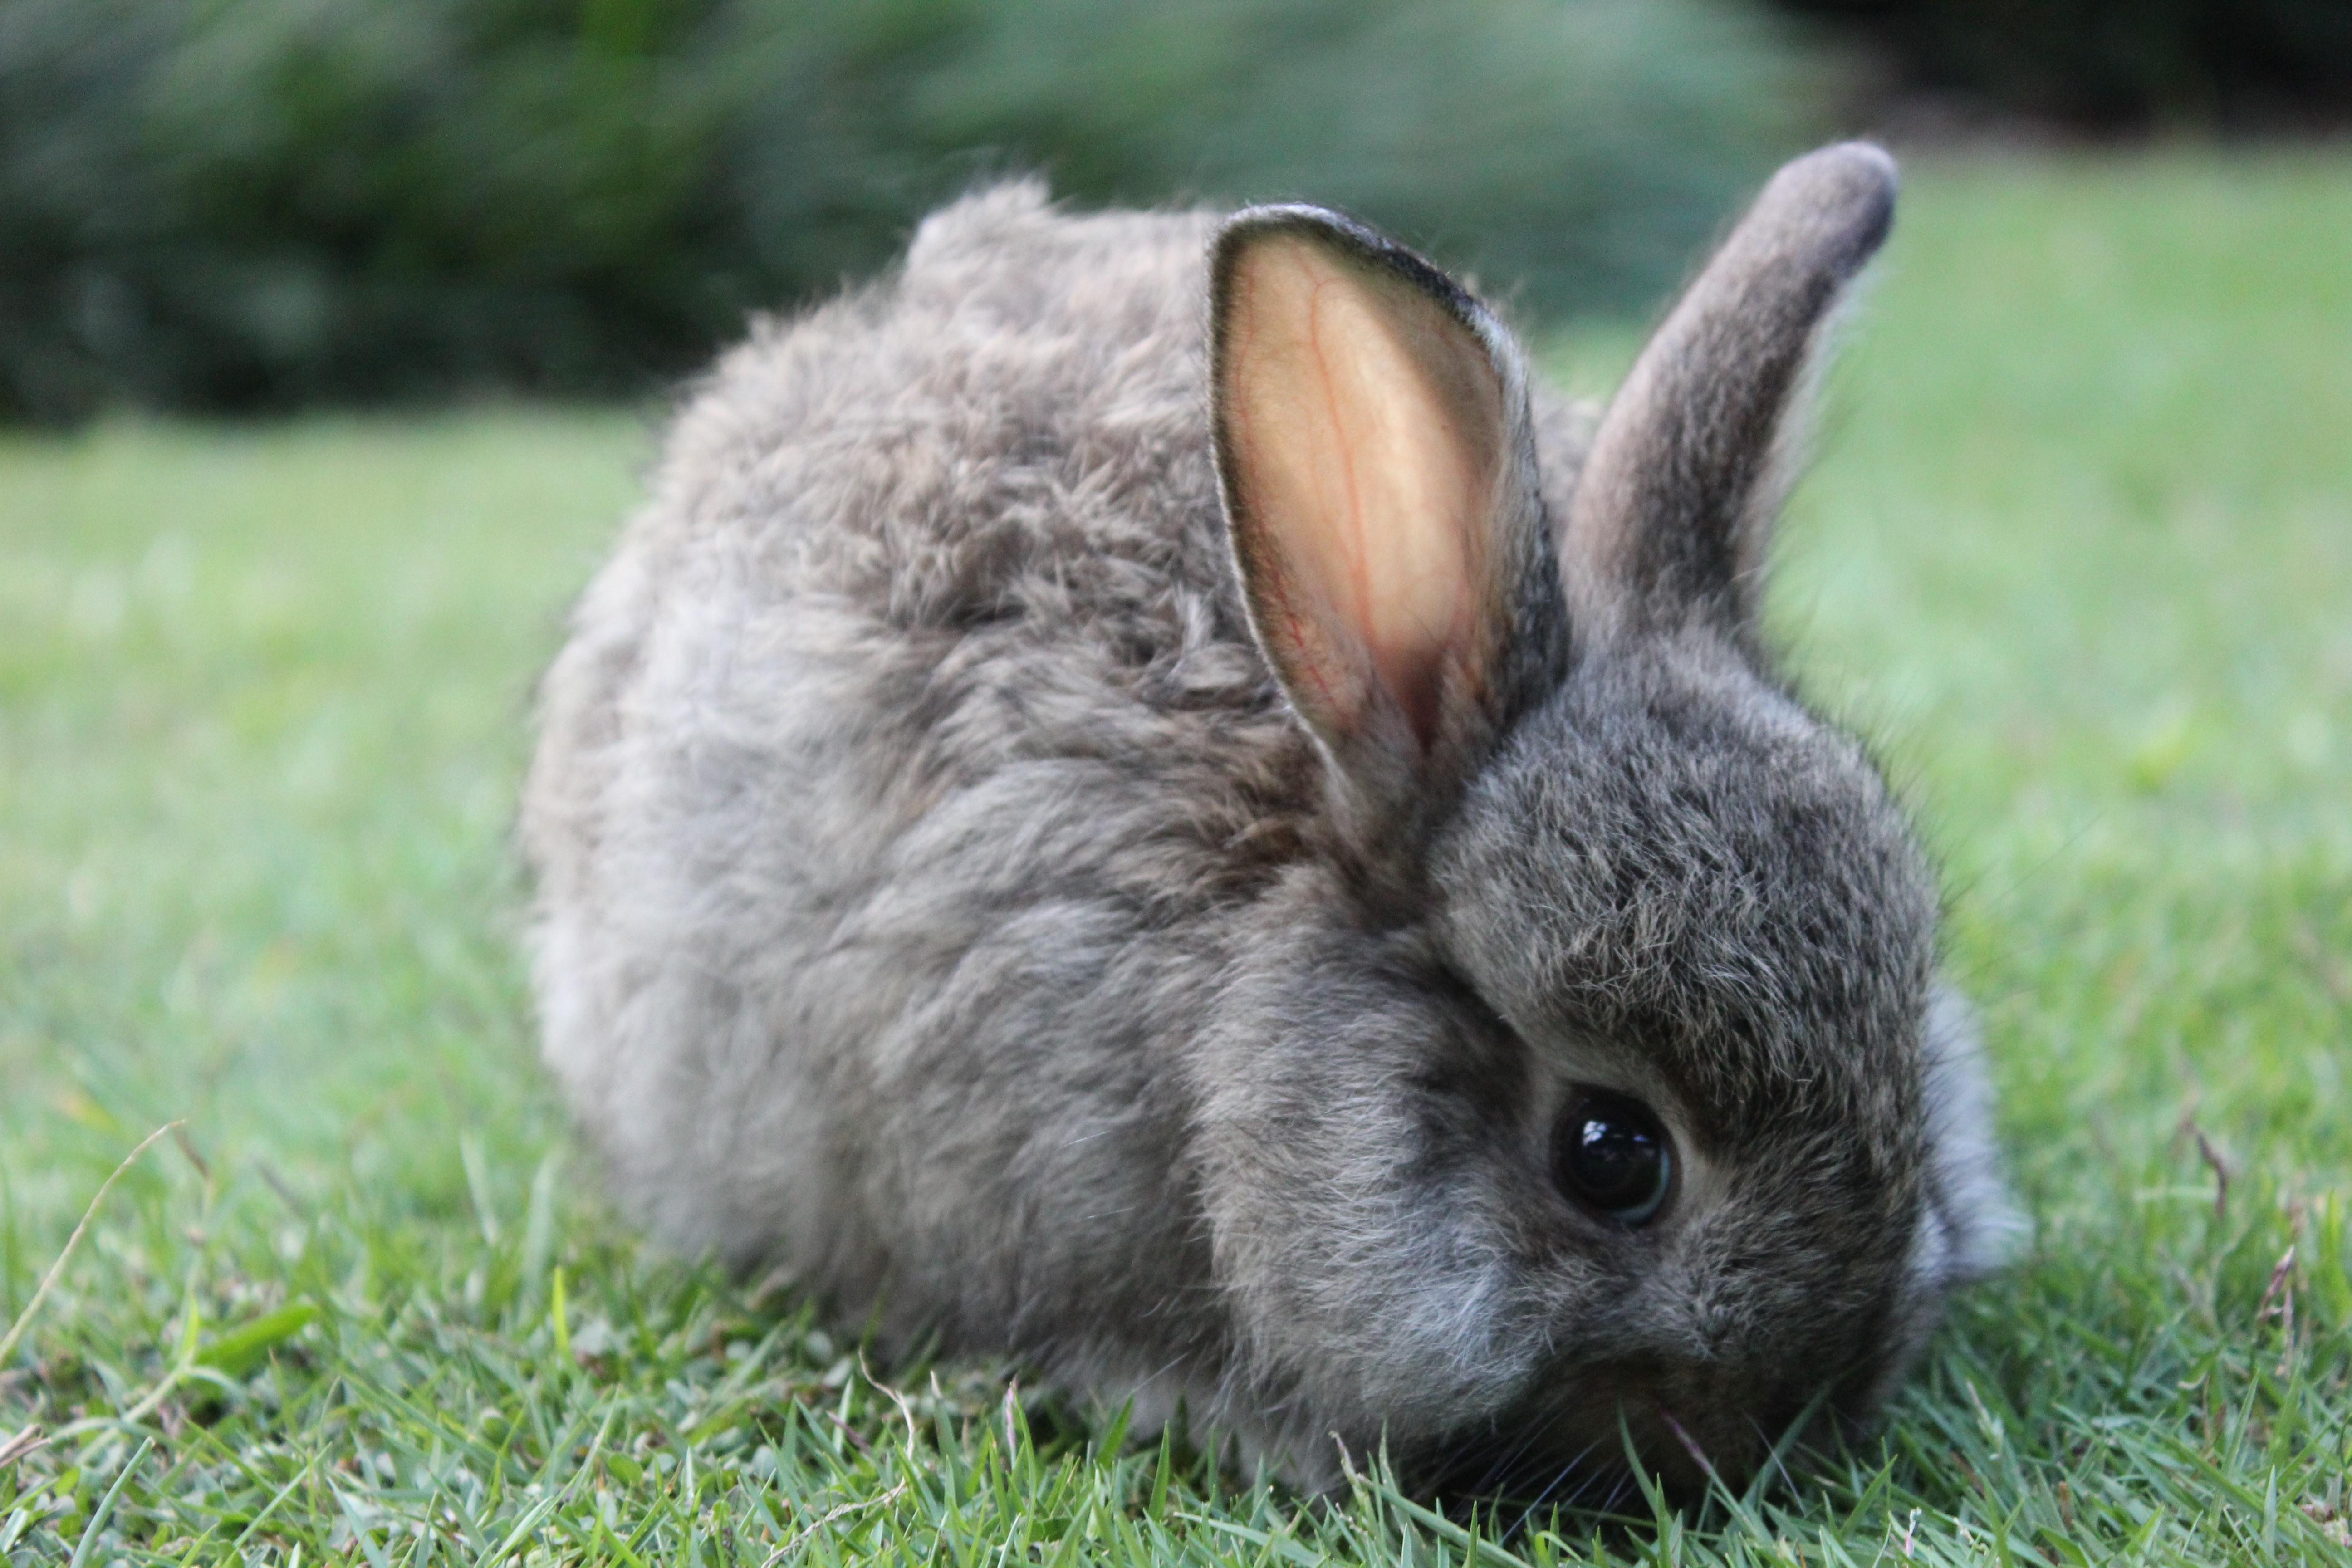 A rabbit eating grass in a garden photo